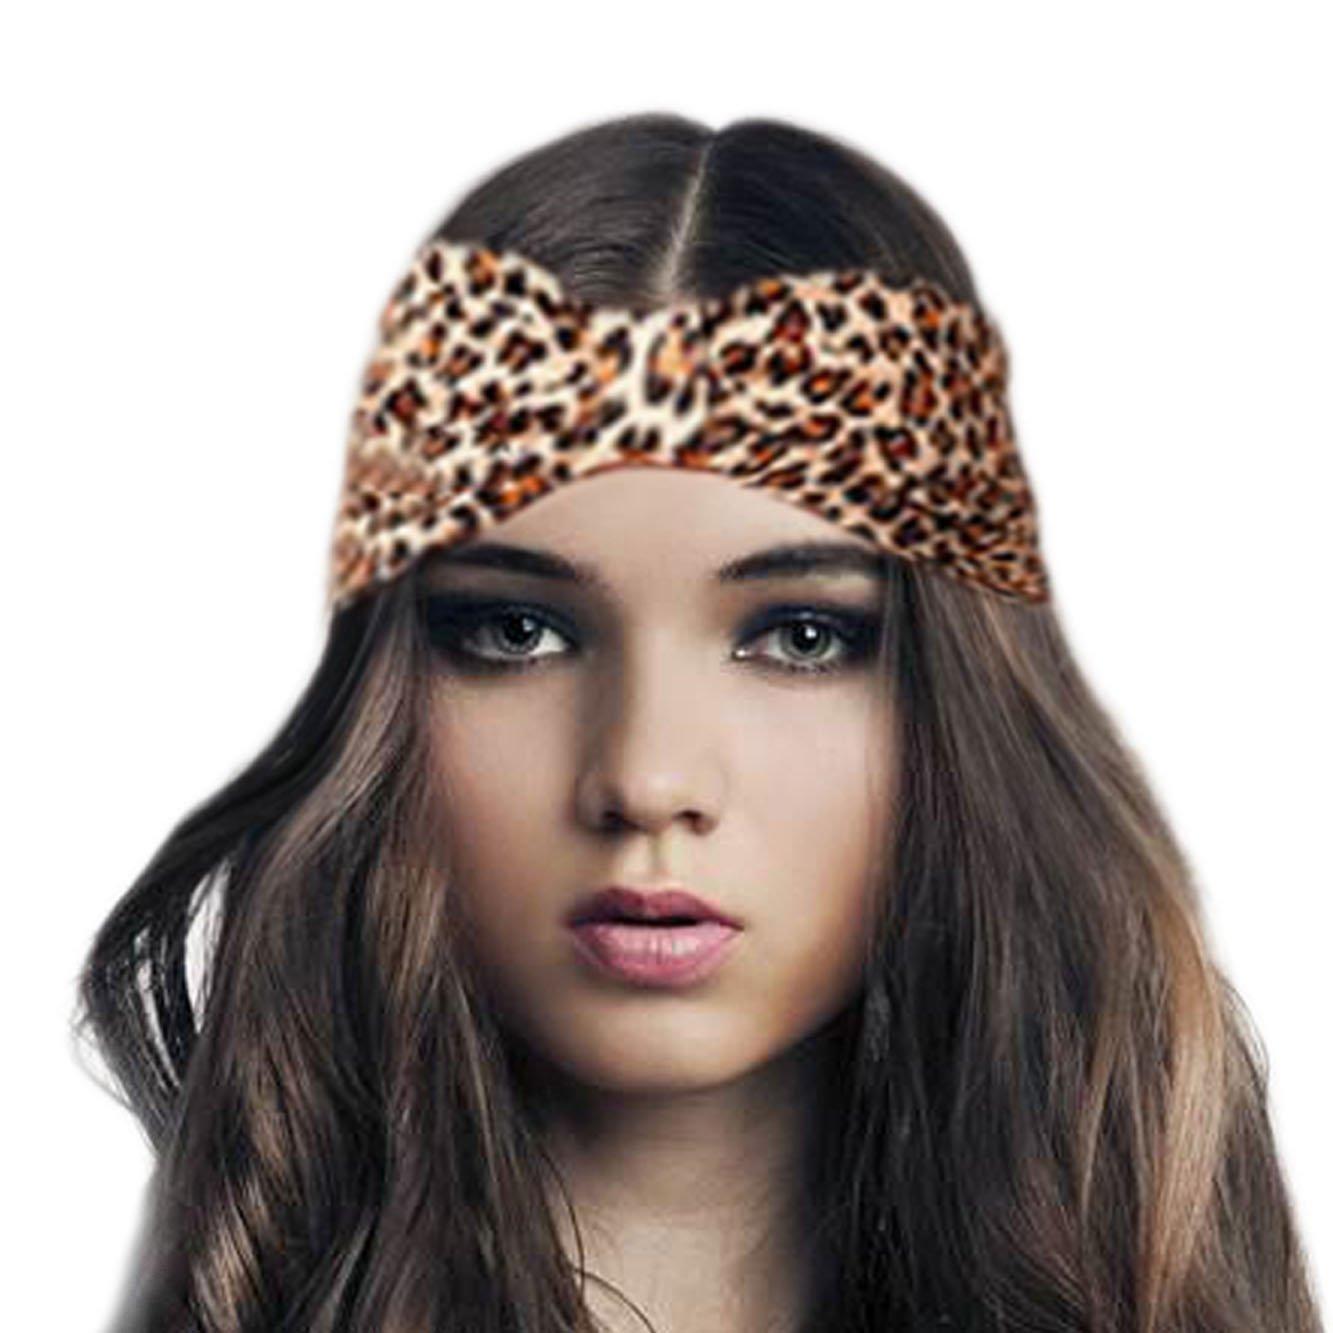 Brown Animal Leopard Print Headband Stretch Elasticated Bandeaux 8cm wide